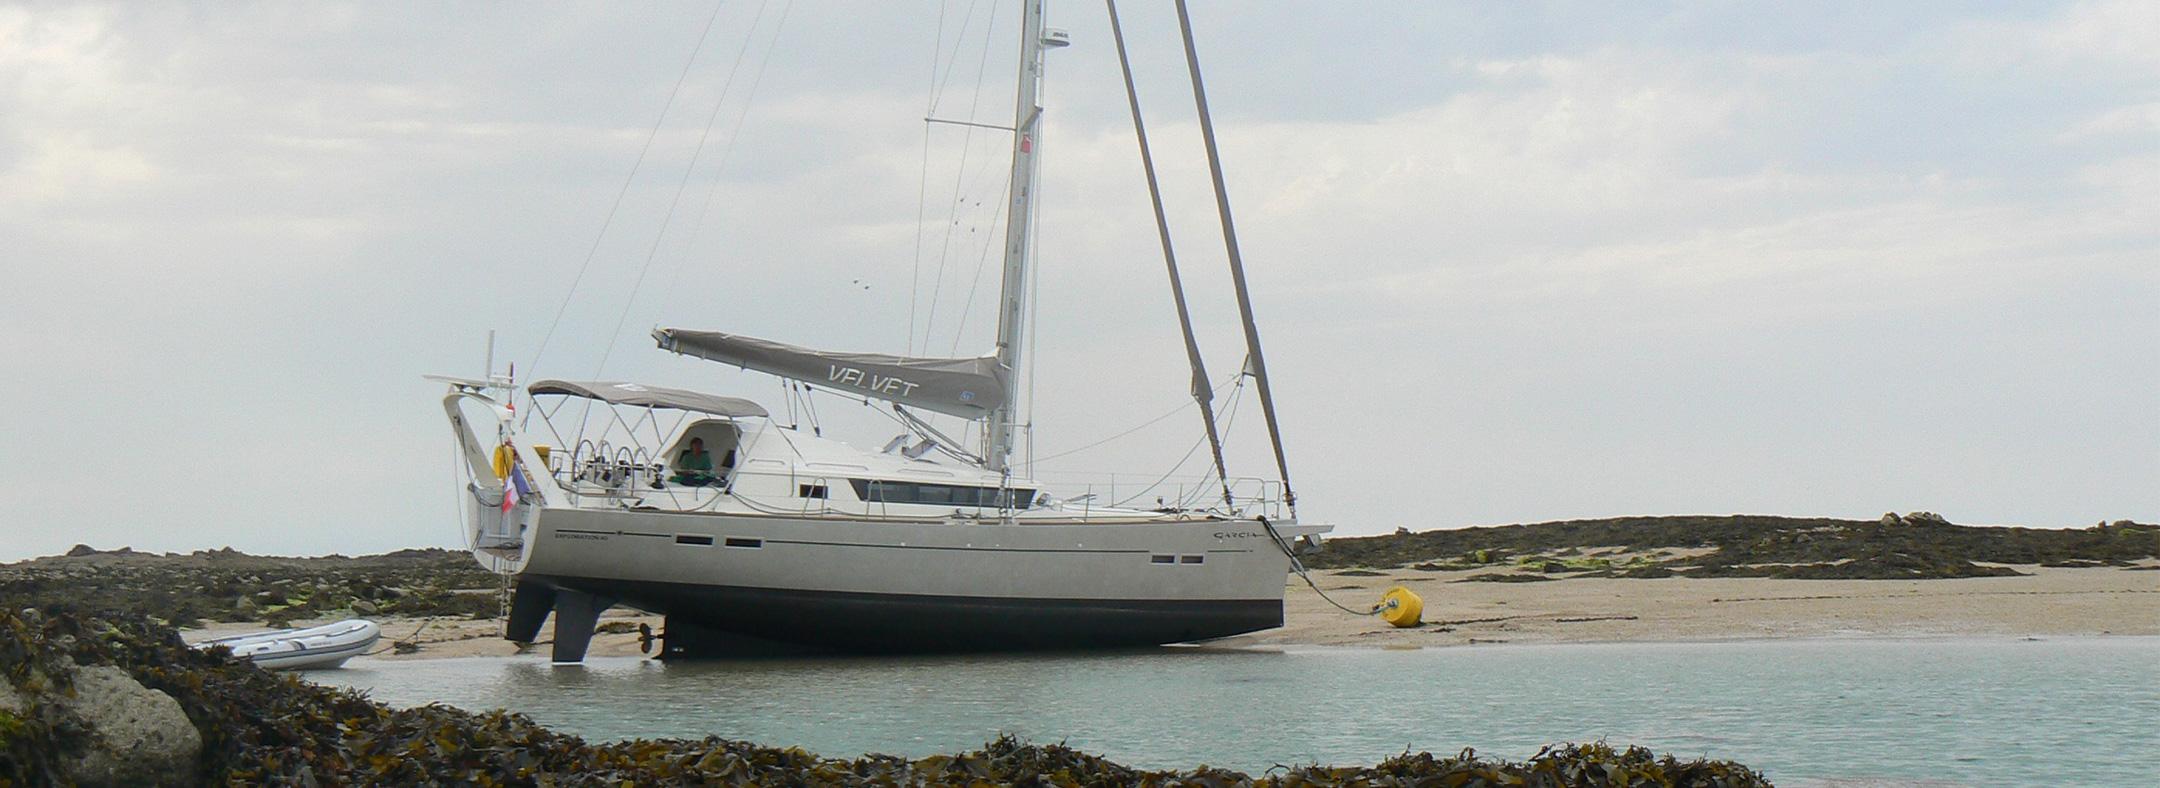 Choosing a Centreboard Yacht - Garcia Yachts